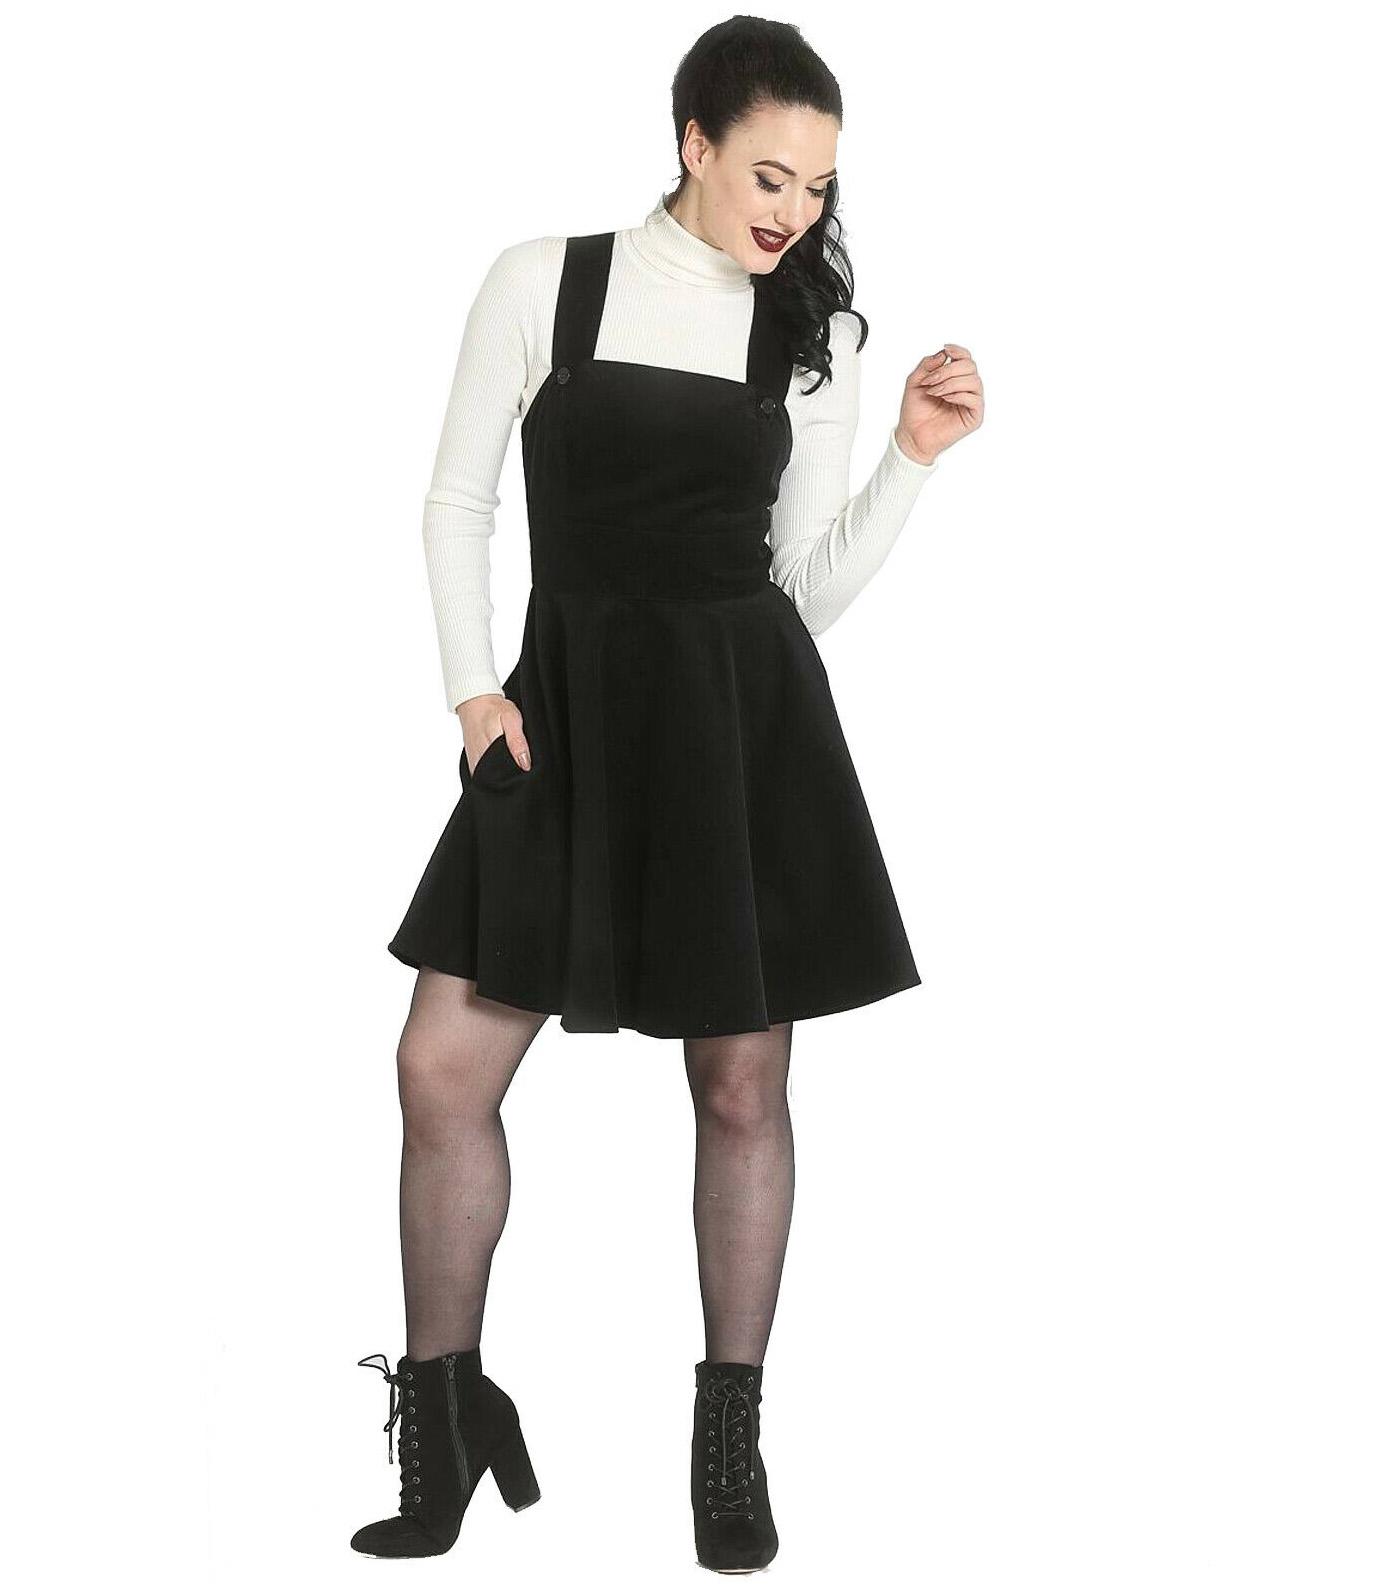 Hell-Bunny-Rockabilly-Corduroy-Mini-Dress-WONDER-YEARS-Pinafore-Black-All-Sizes thumbnail 19